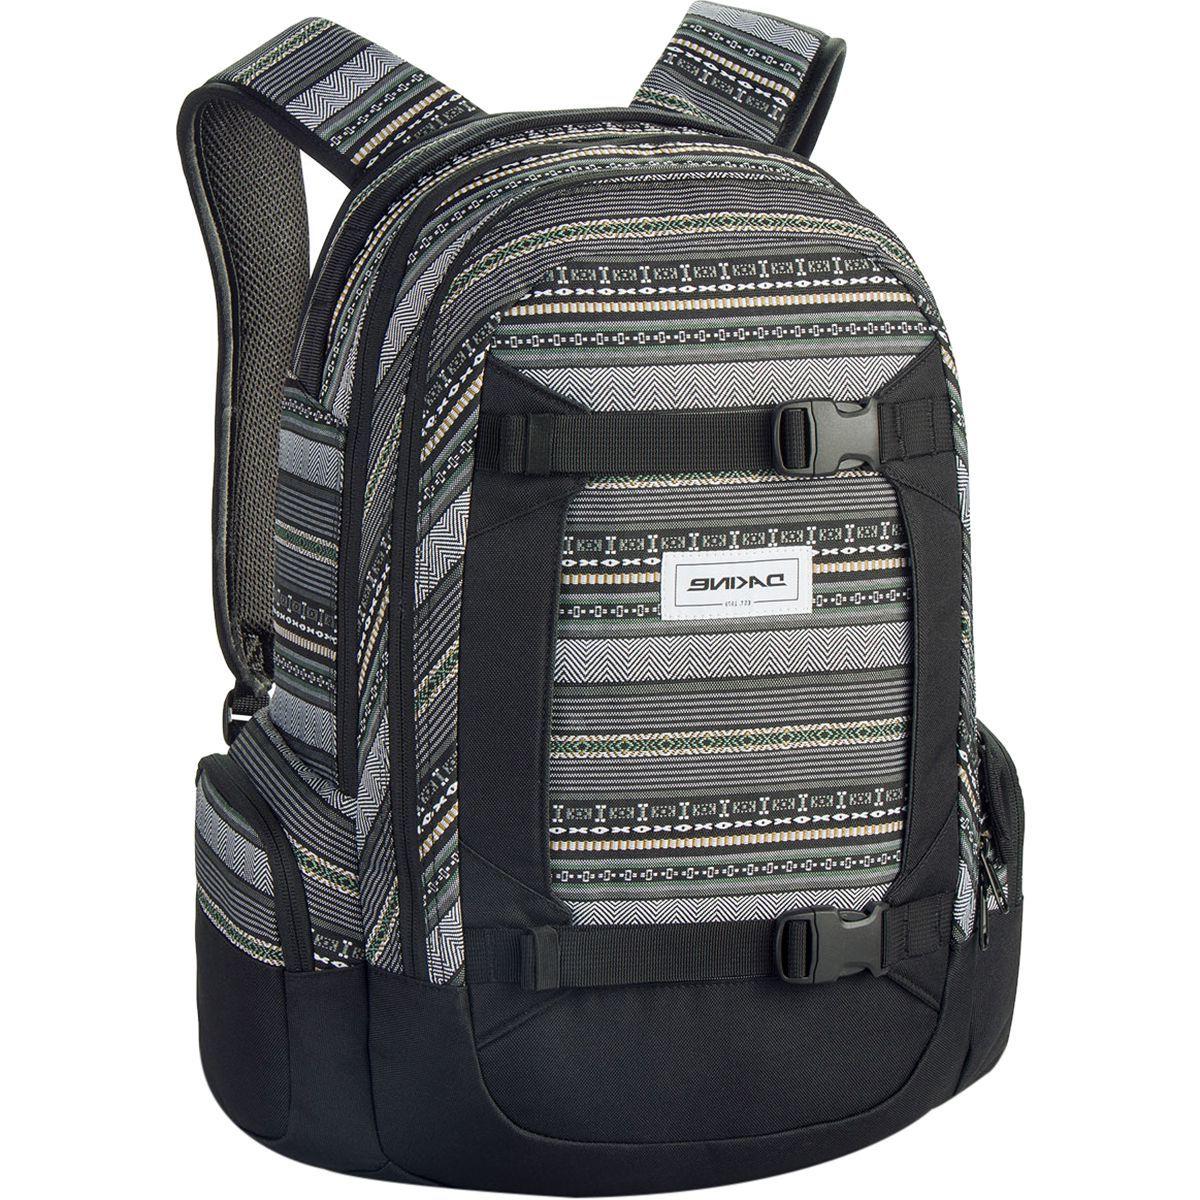 DAKINE Mission 25L Backpack - Women's